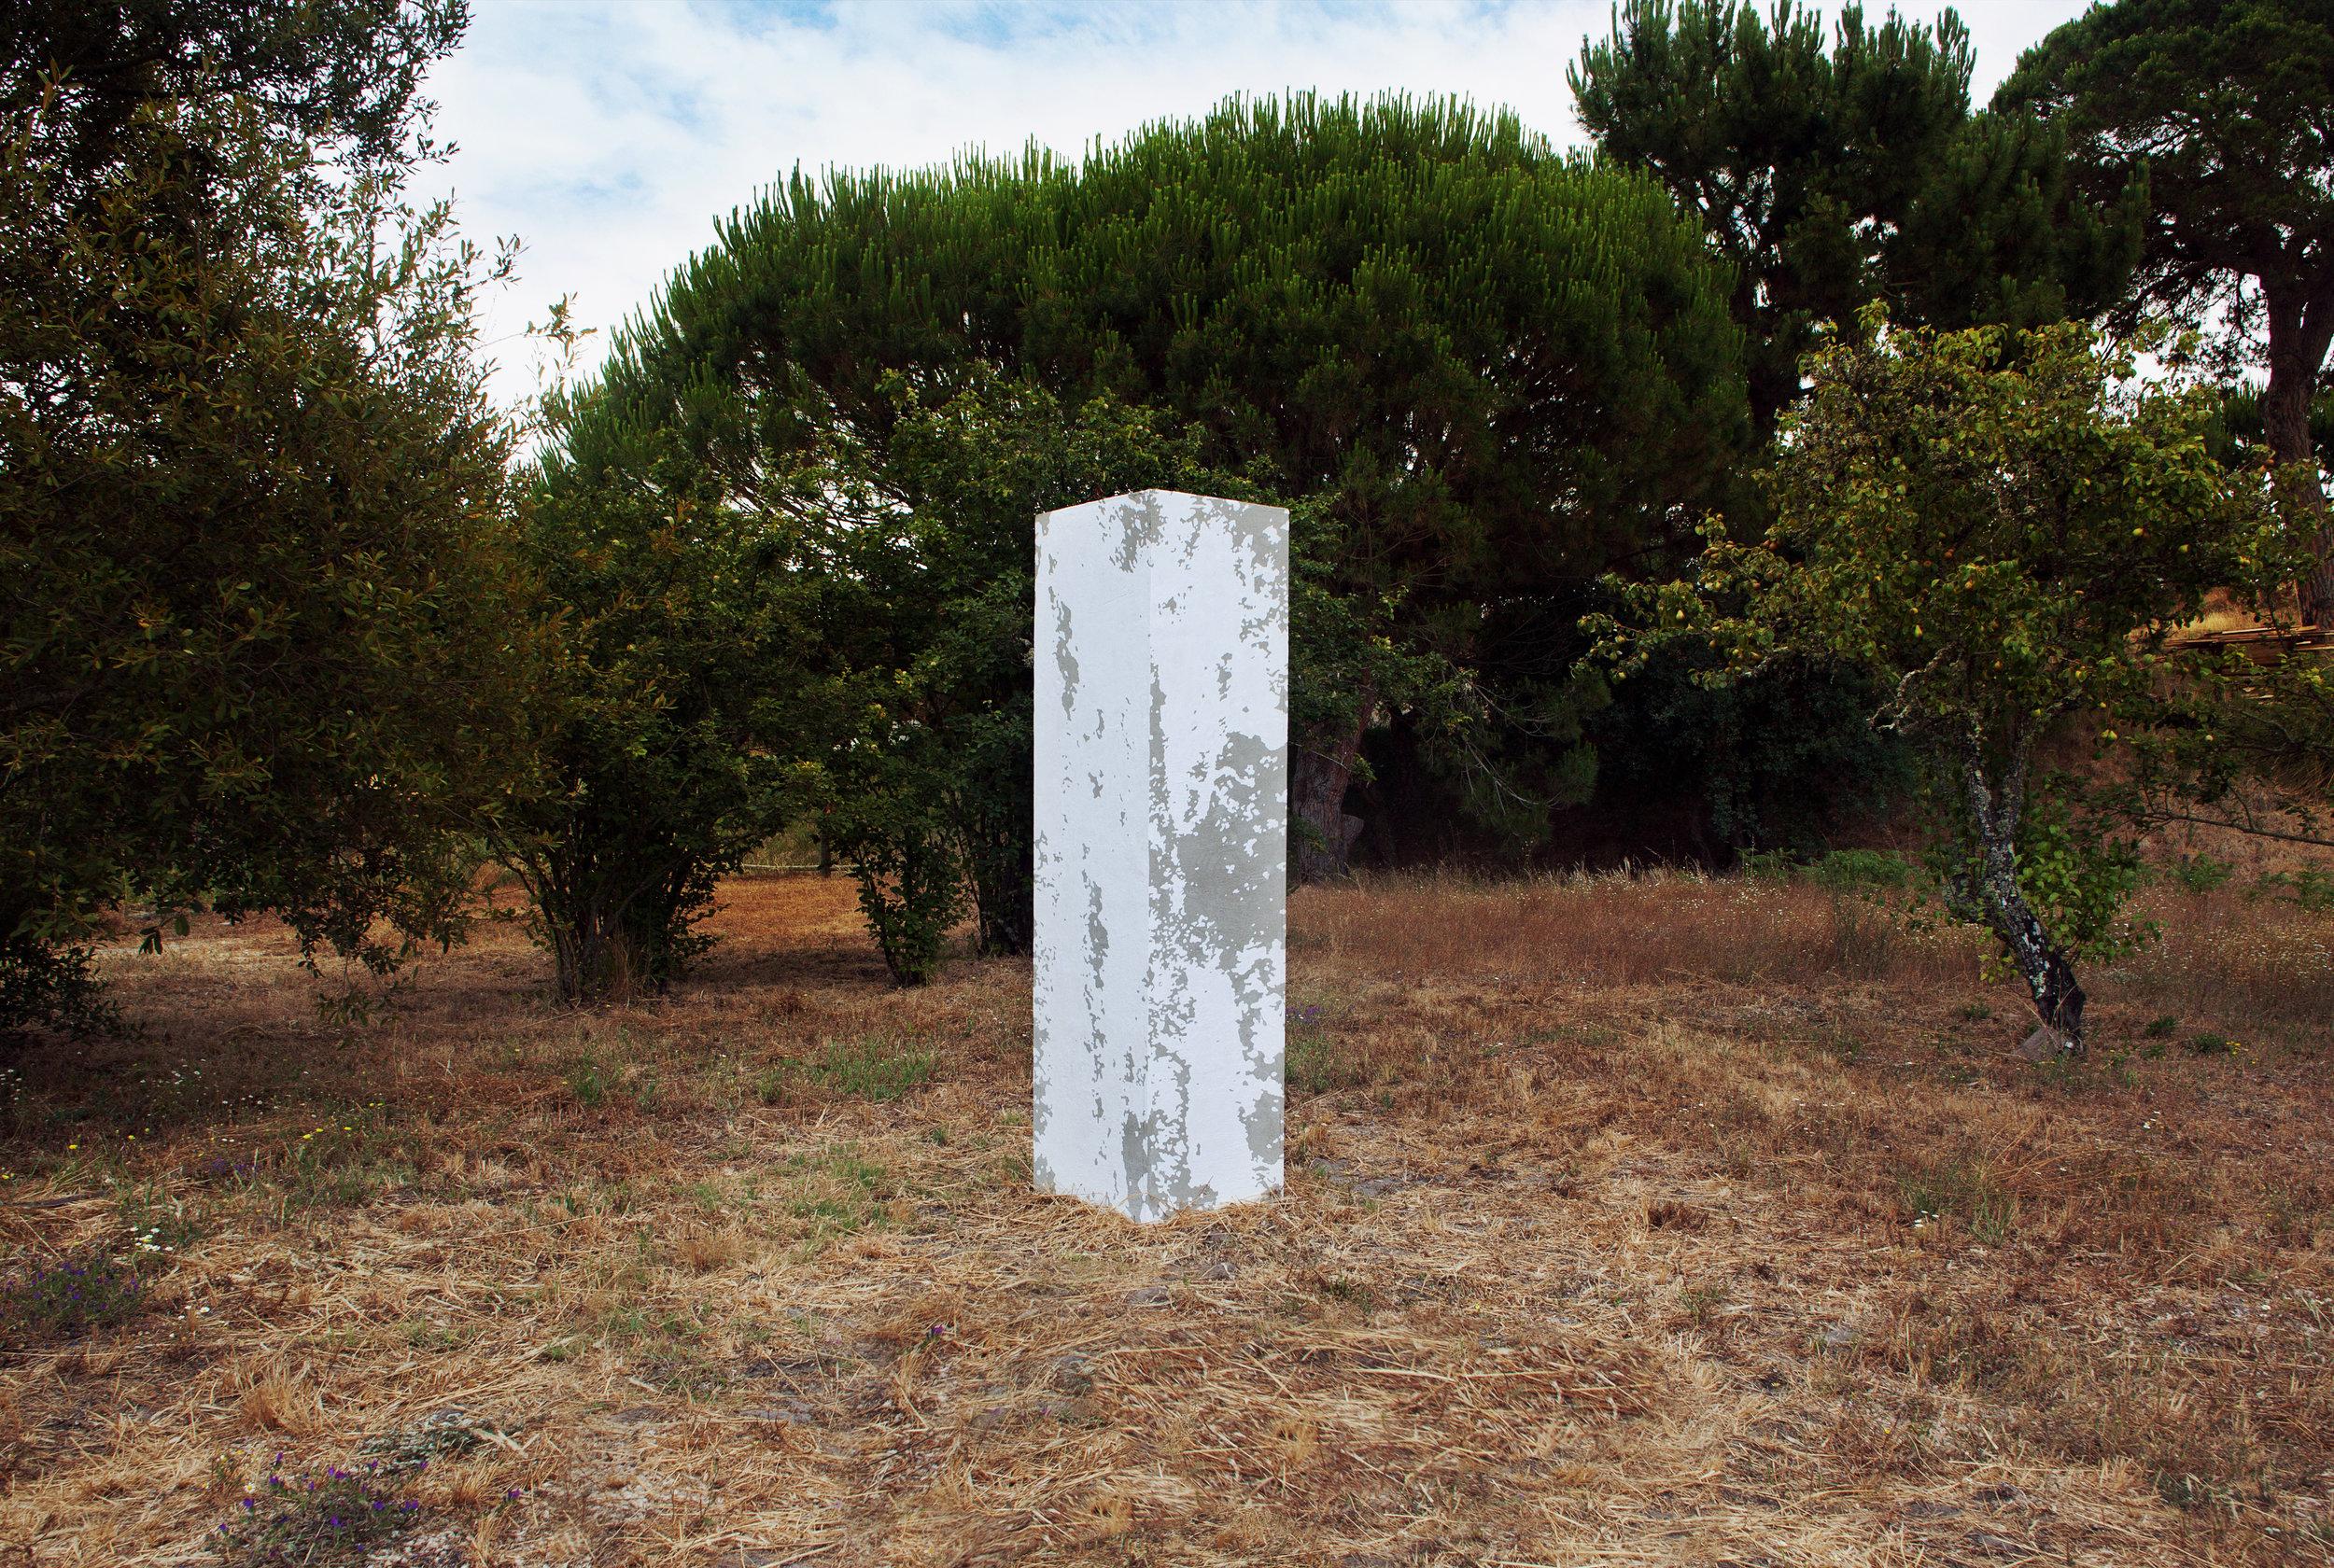 Pedro Matos  Even If No One Else Comes , 2015 Plywood, Cement, Acrylic 201,5 x 51,5 x 51,5cm Photo: Pedro Matos